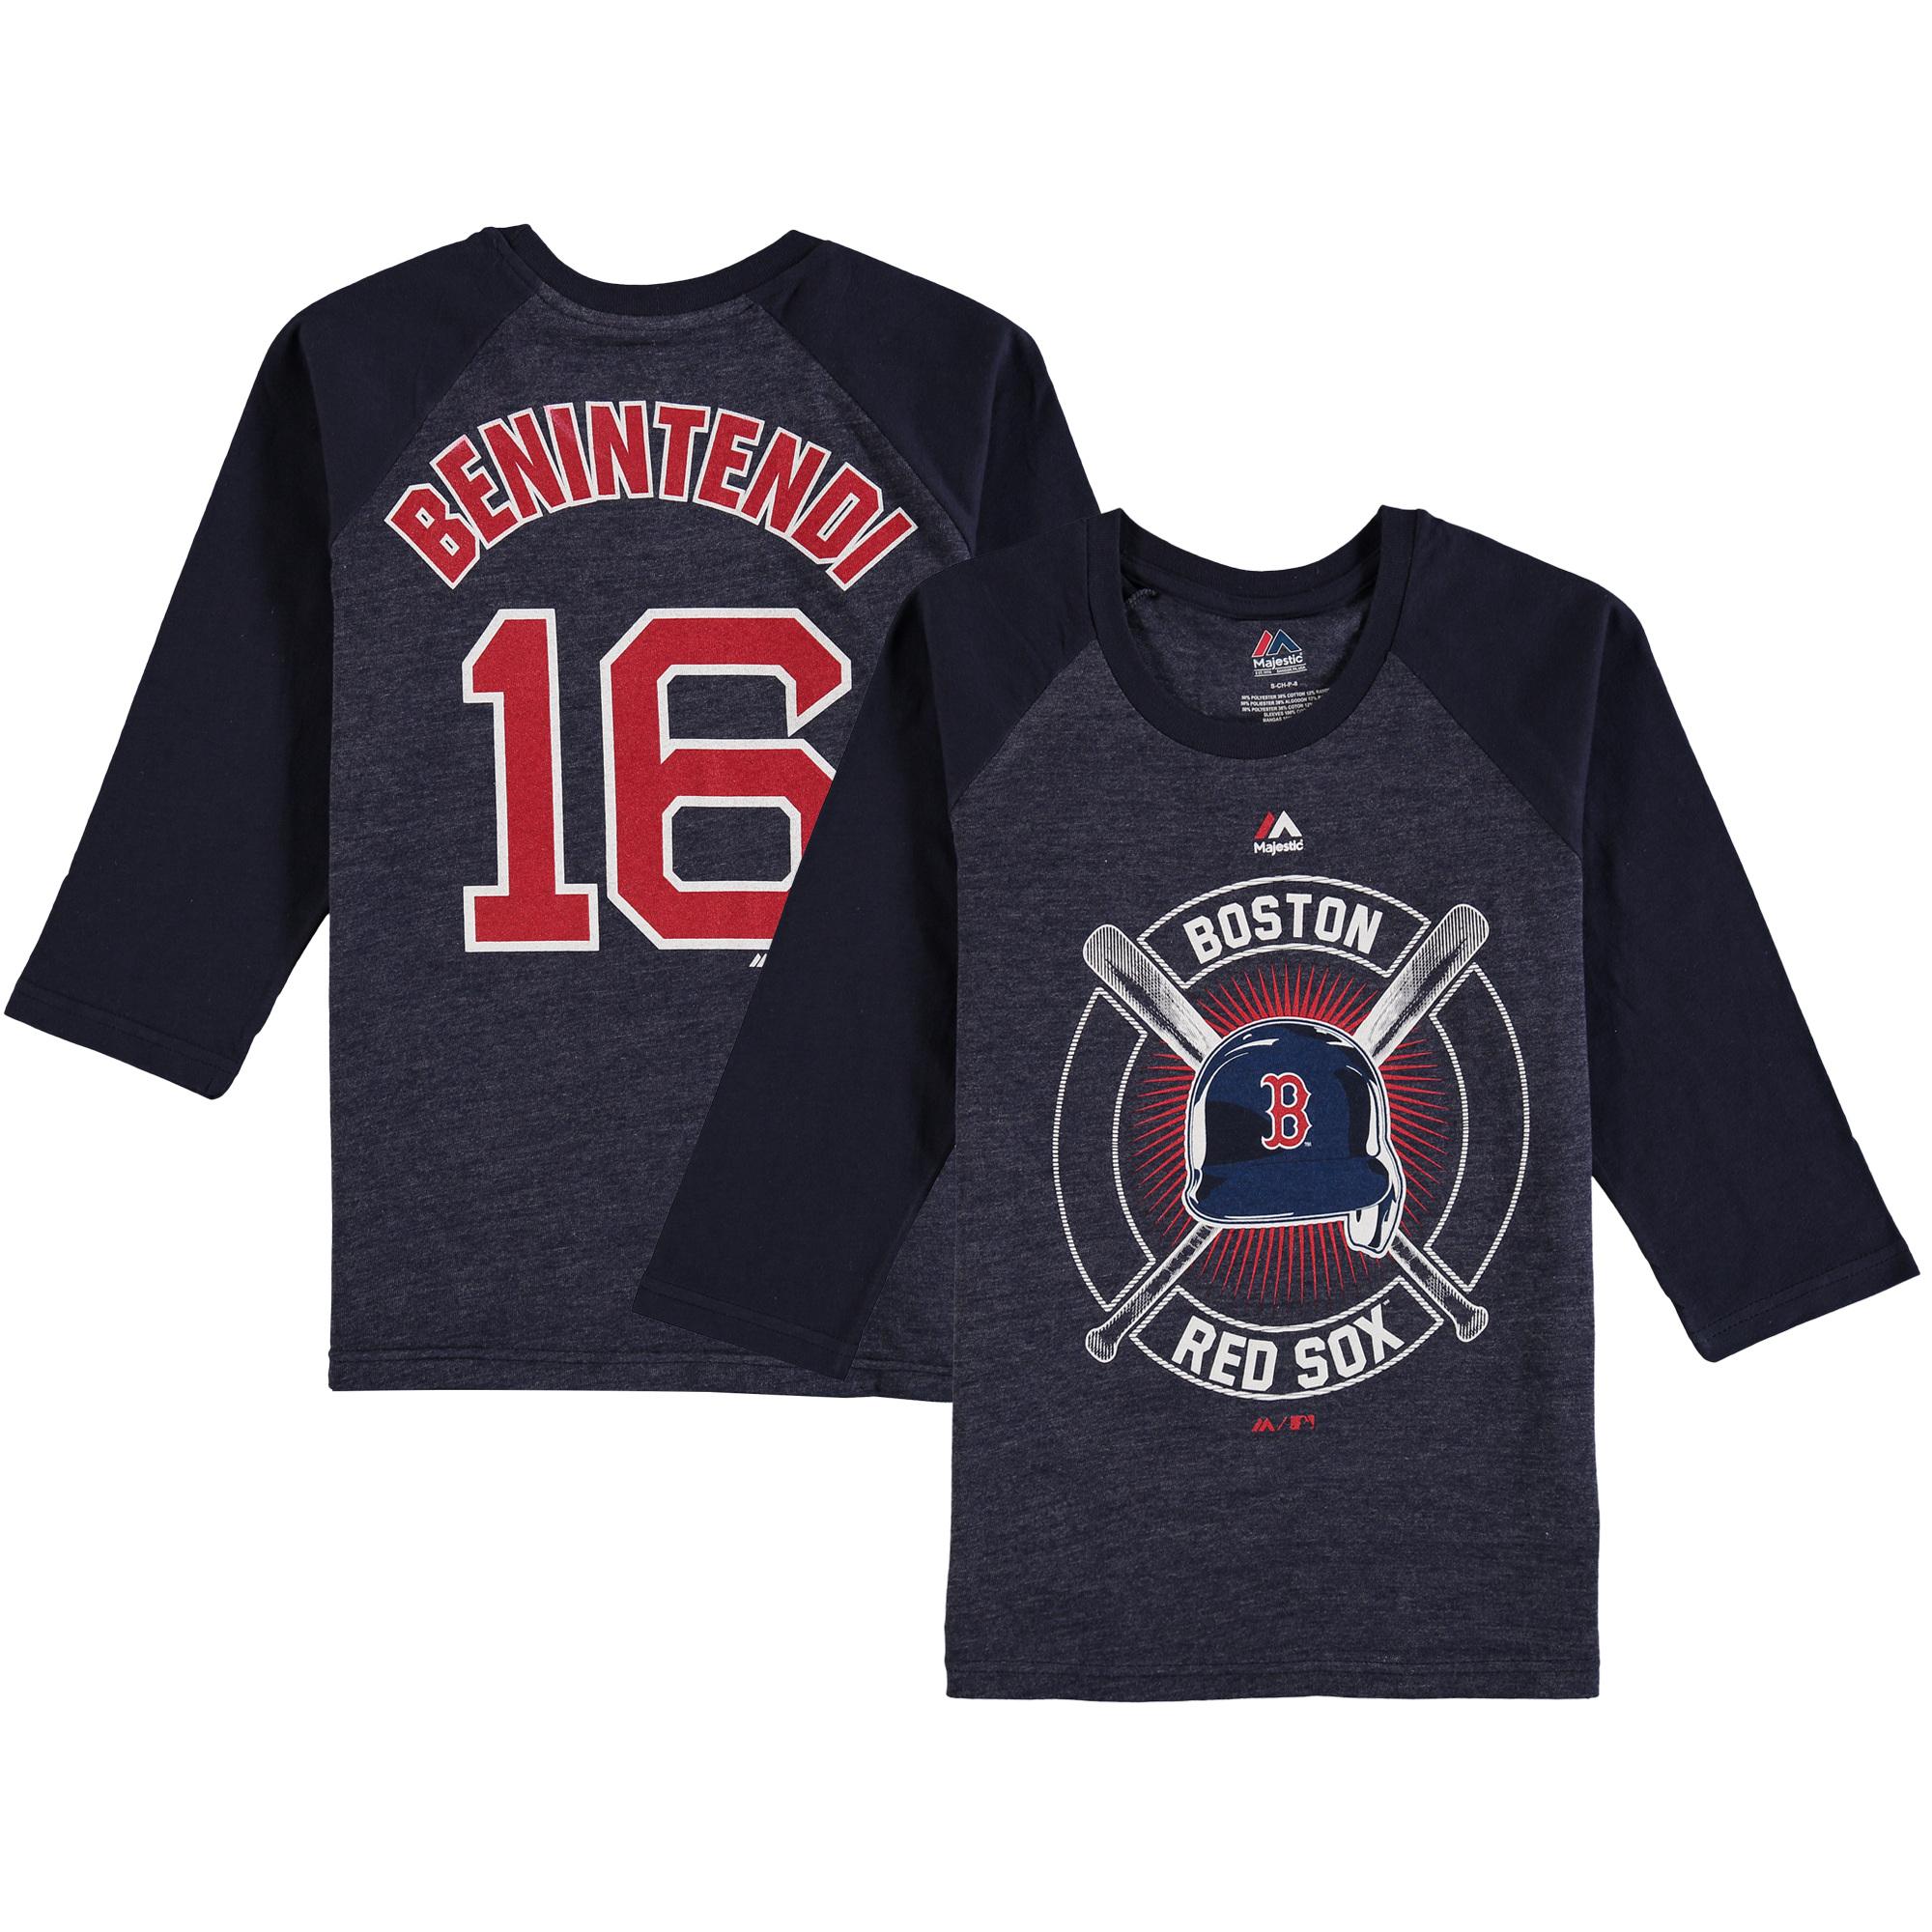 Andrew Benintendi Boston Red Sox Youth Name & Number Tri-Blend 3/4-Sleeve Raglan T-Shirt - Navy